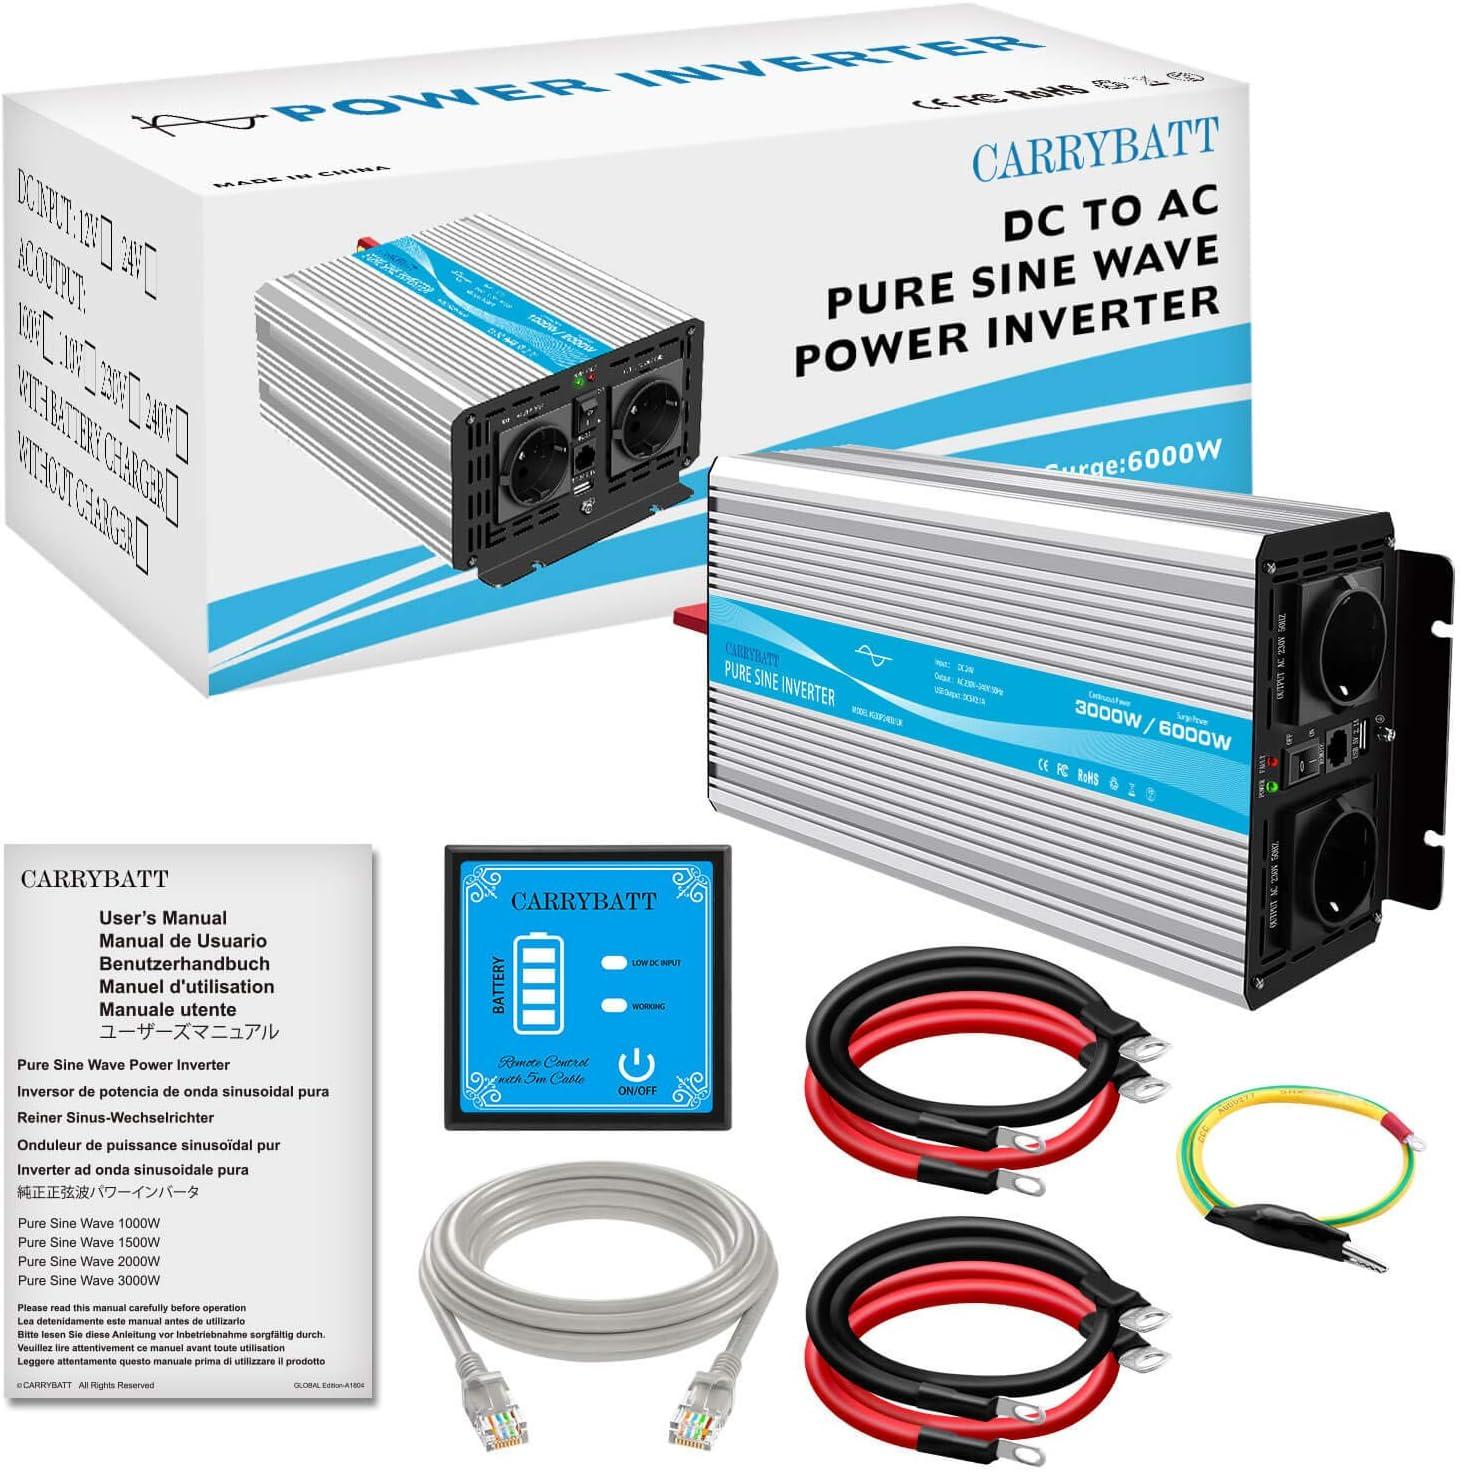 CARRYBATT Inversor de Corriente de Onda sinusoidal Pura 3000W//6000W Convertidor DC 24V a AC 220V 230V con Mando a Distancia /& Salidas de AC duales y Puerto USB